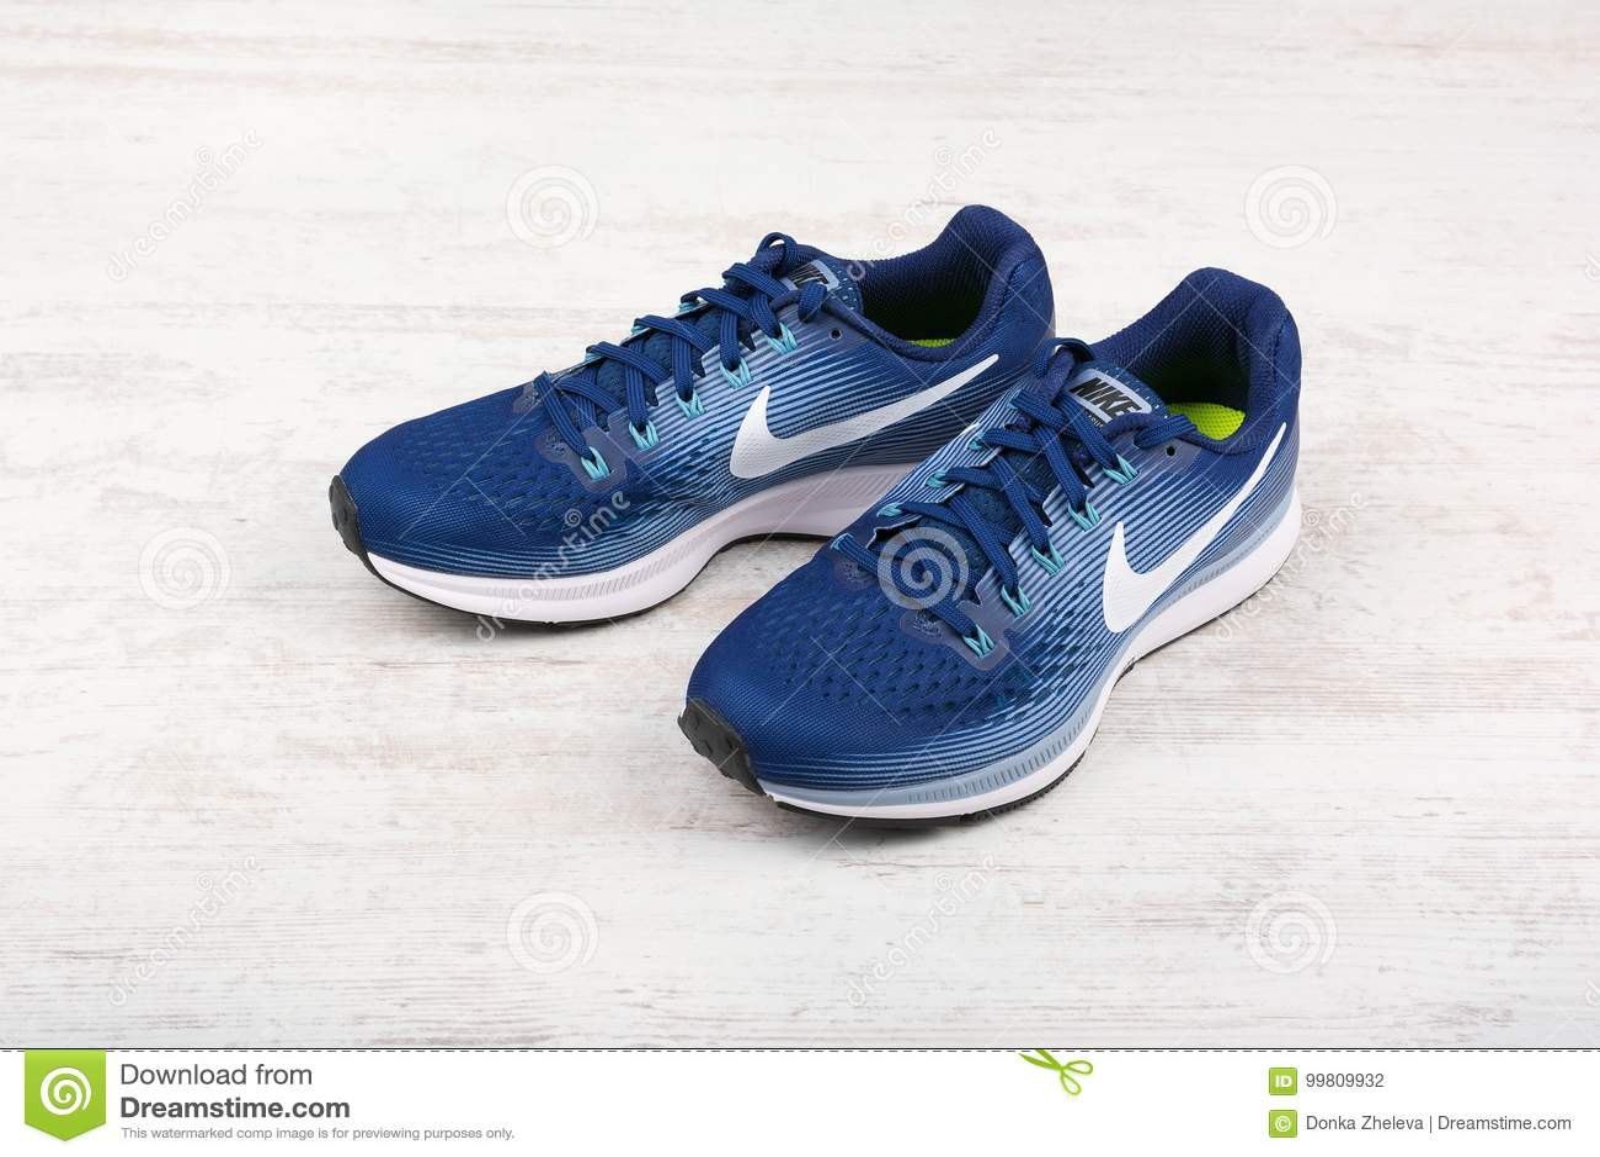 f506f393434 BURGAS, ΒΟΥΛΓΑΡΊΑ - 6 ΣΕΠΤΕΜΒΡΊΟΥ 2017: Ζουμ Pegasus αέρα της Nike 34 τρέχοντας  παπούτσια γυναικών ` s στο μπλε στο άσπρο ξύλινο υπόβαθρο Η Nike είναι ...